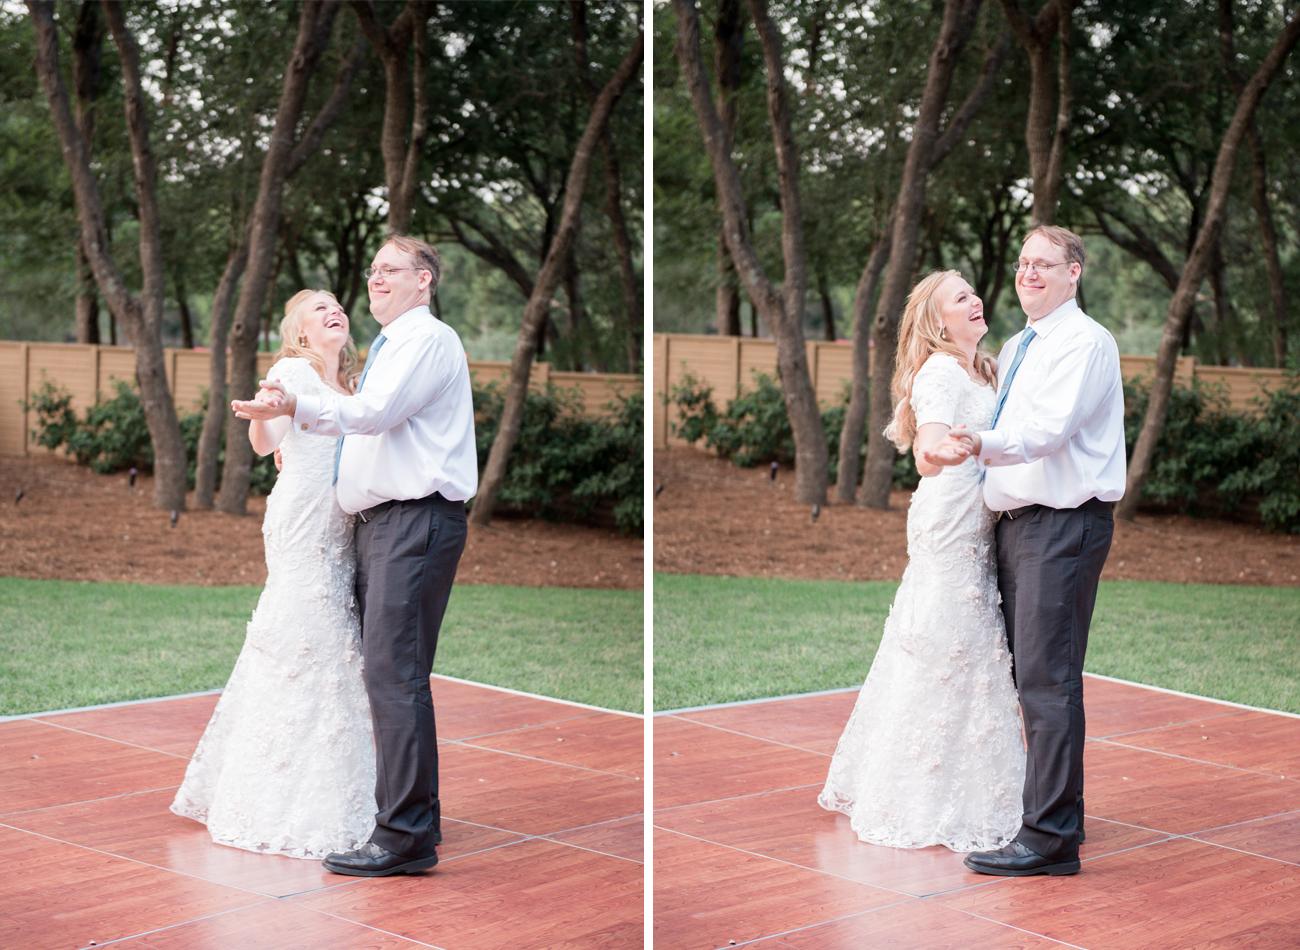 Rebekah and Brian | San Antonio LDS Wedding Photographer-29.5